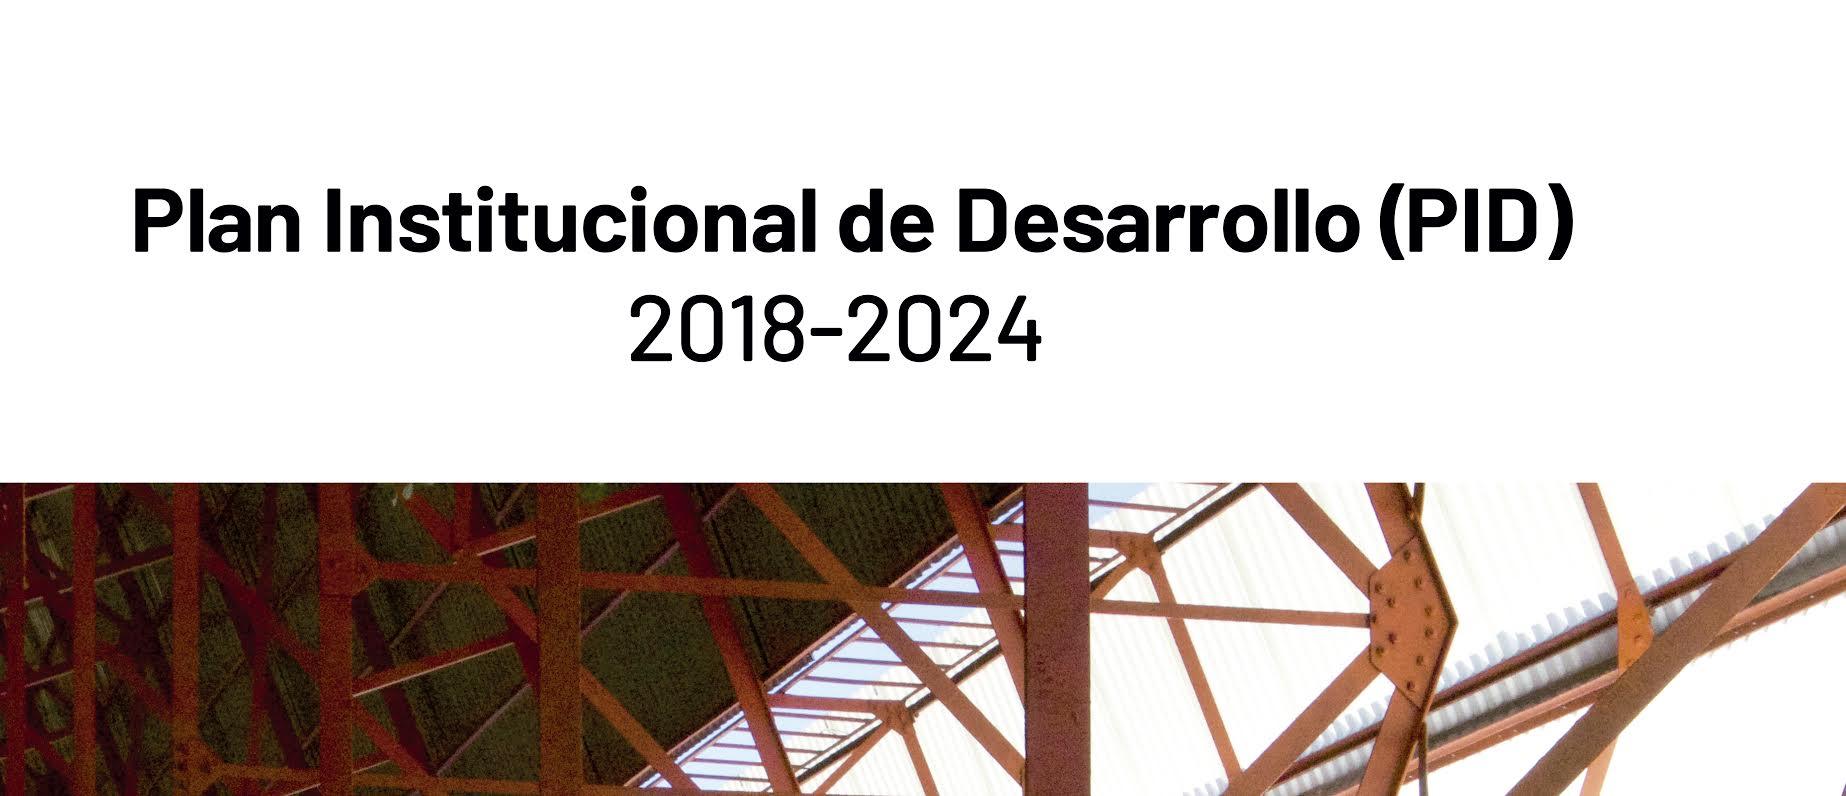 PLAN INSTITUCIONAL DE DESARROLLO